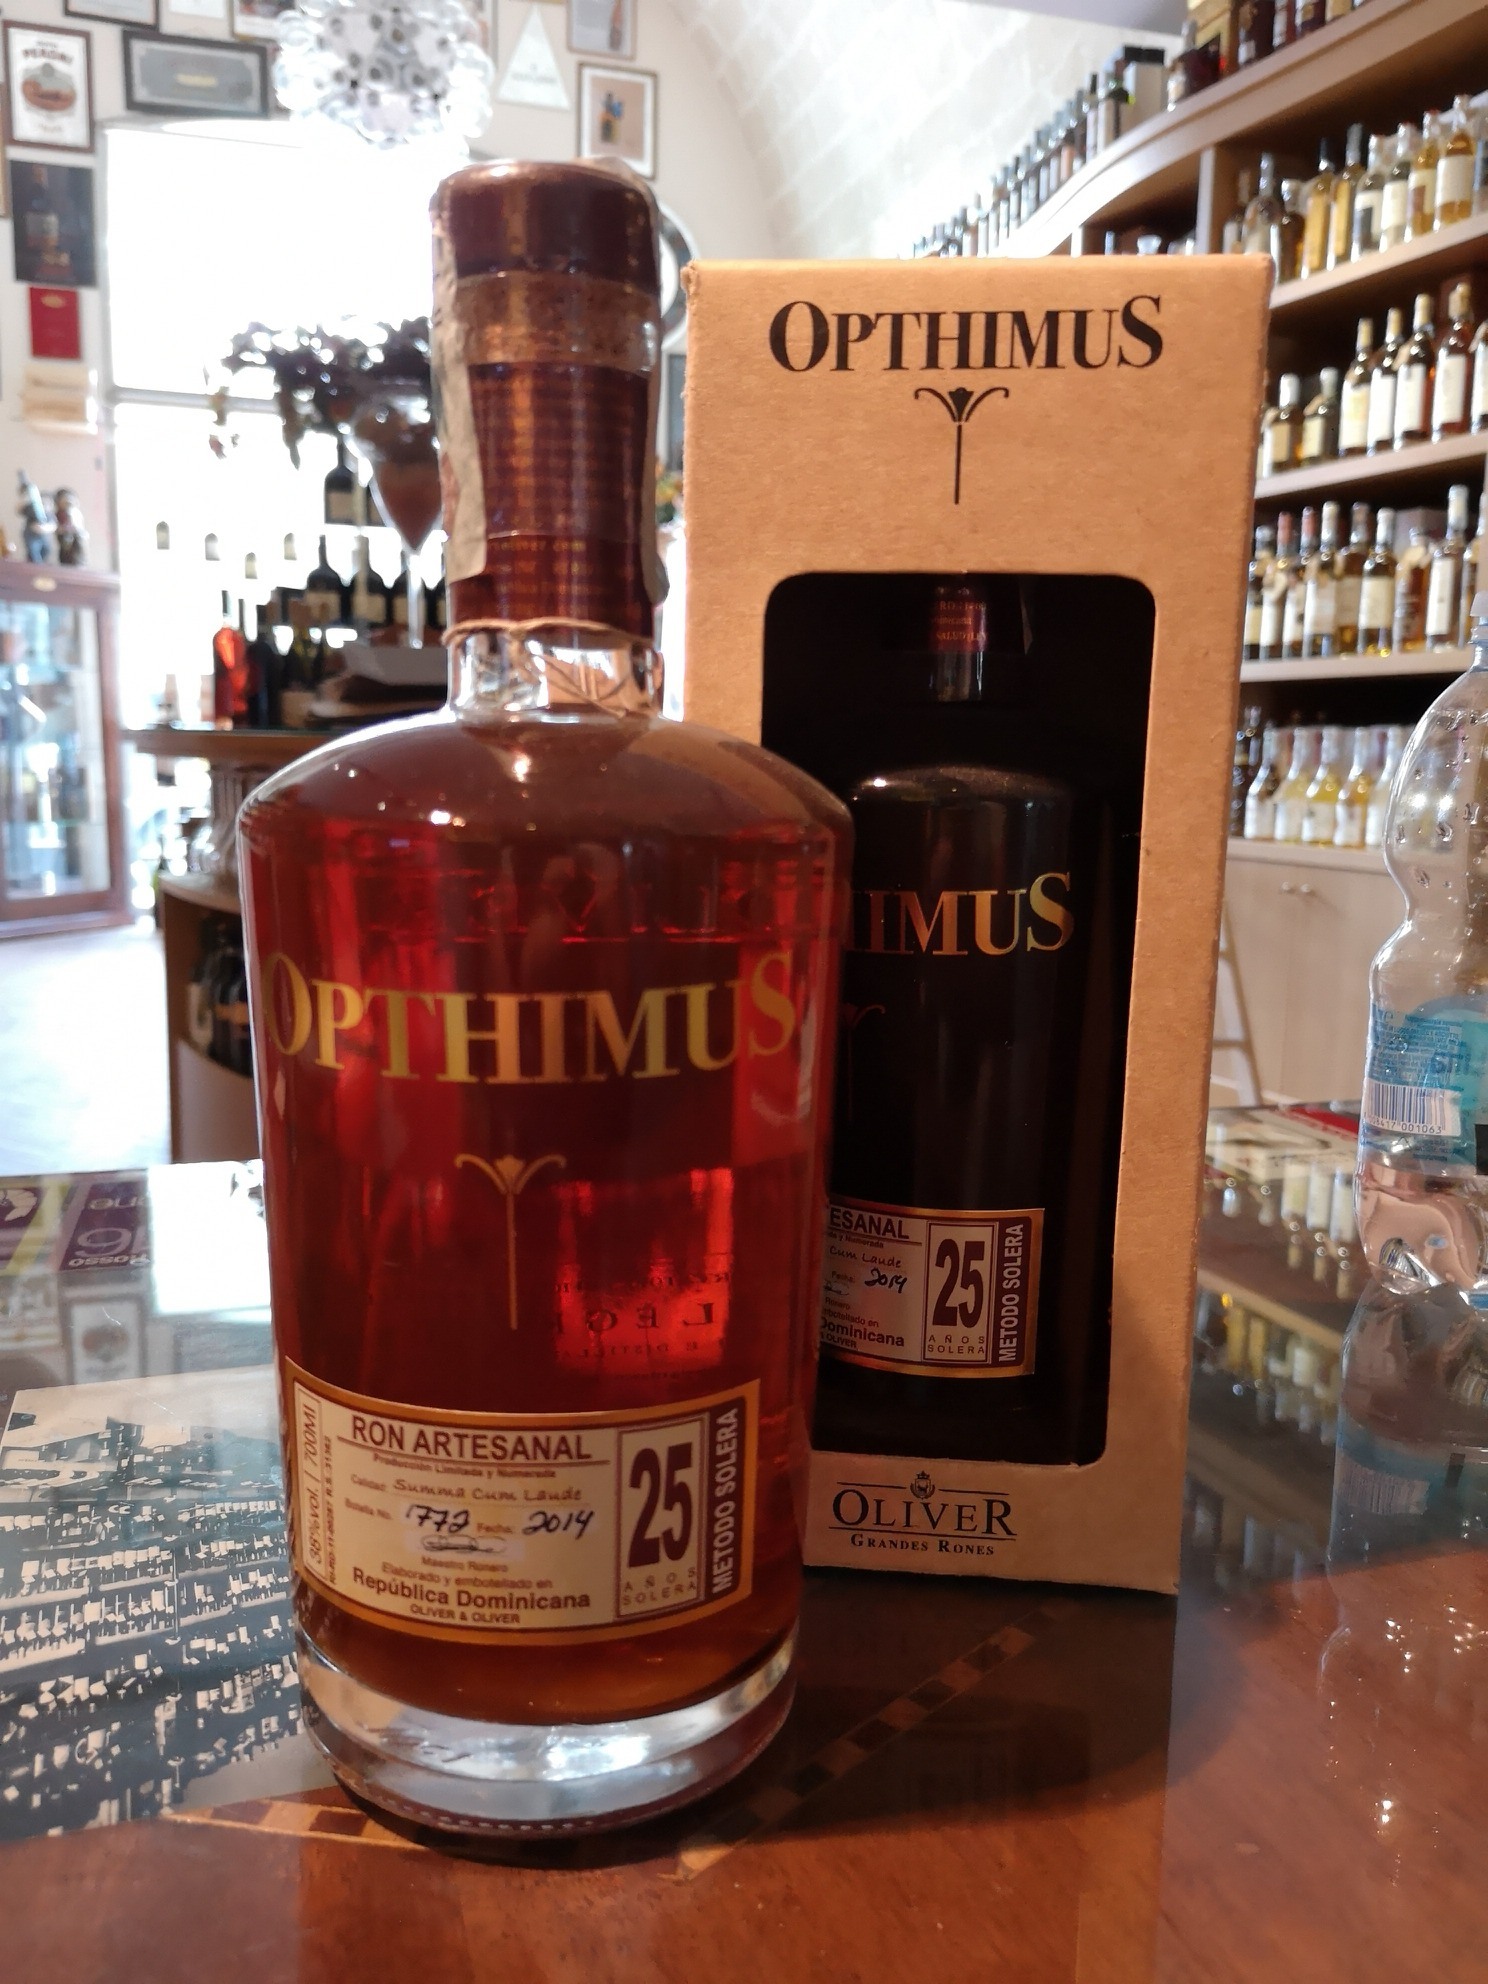 Opthimus 25 Anni